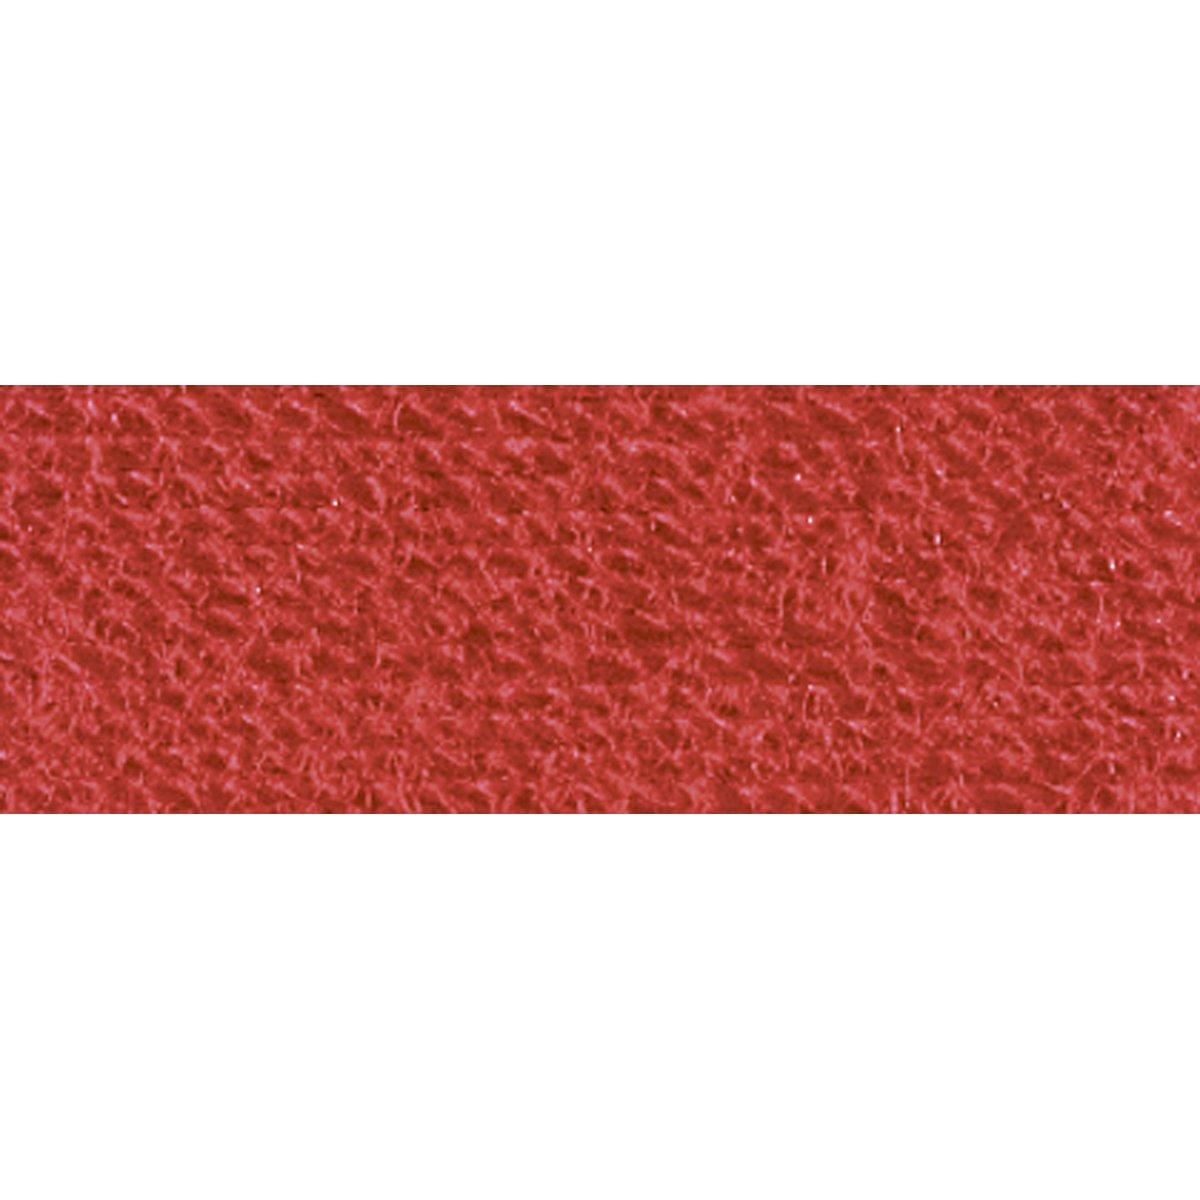 DMC 167GA 10-666 Cebelia Crochet Cotton, 282-Yard, Size 10, Bright Red Notions - In Network